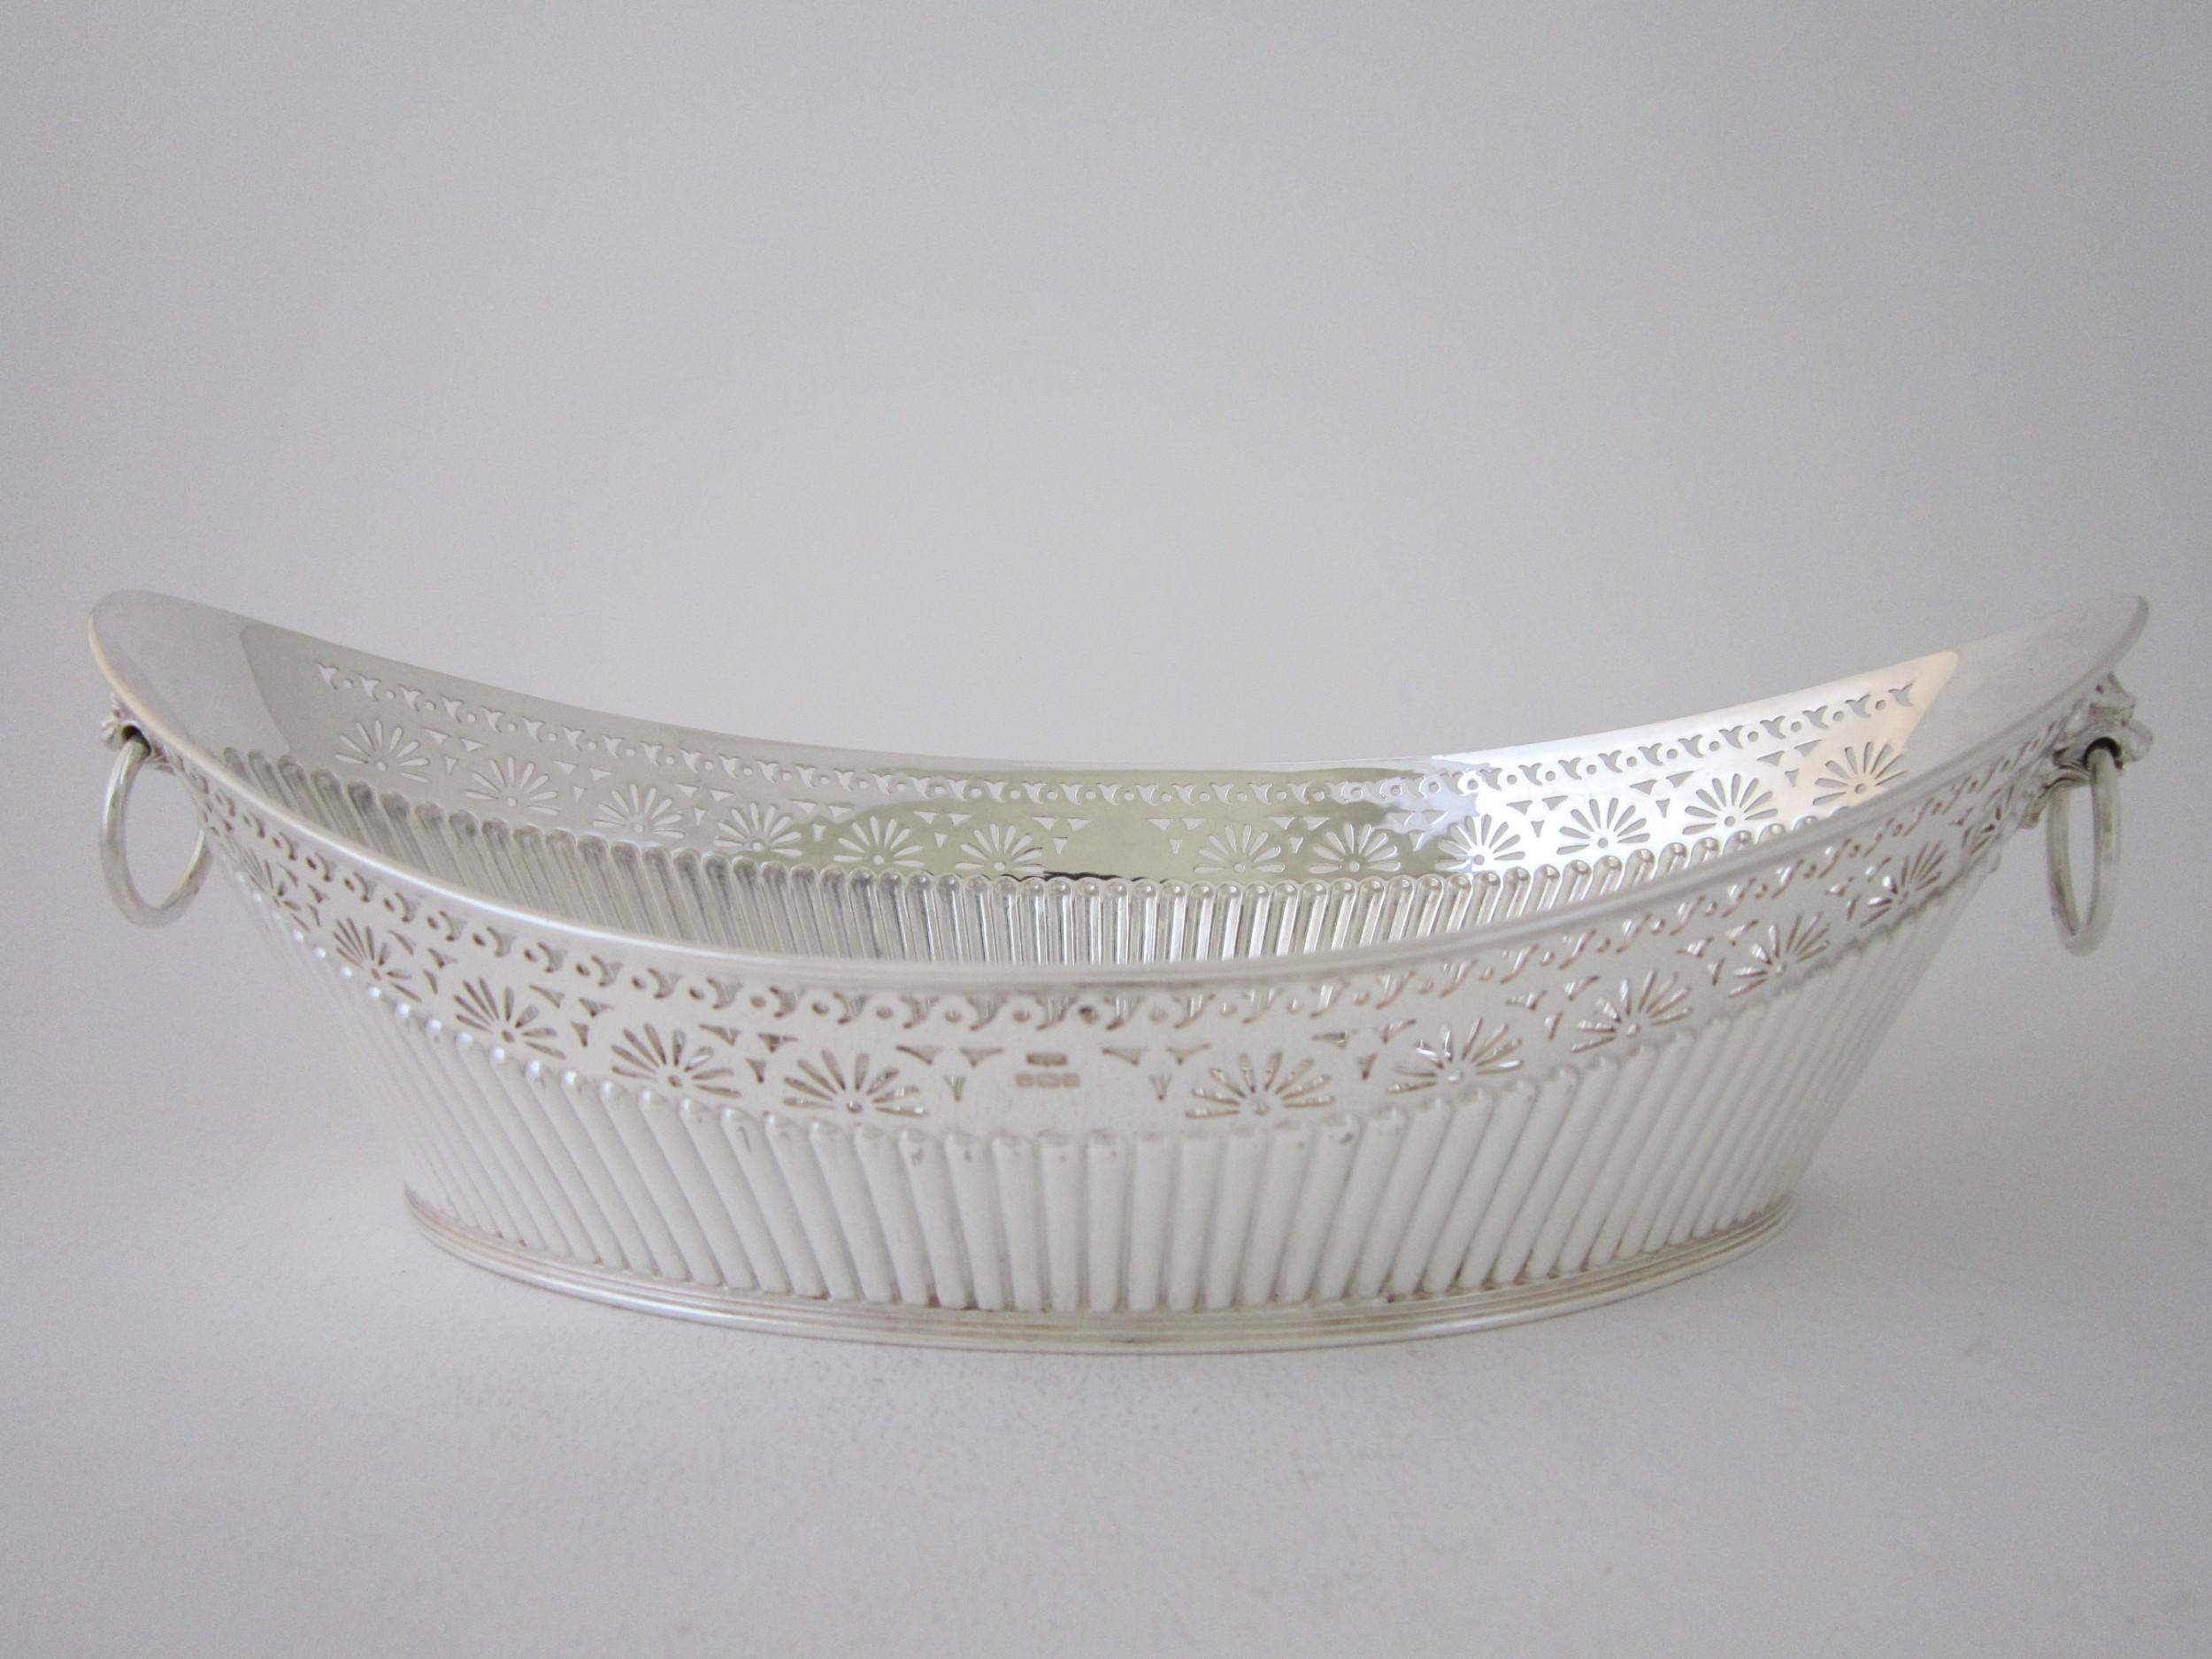 antique edwardian sterling silver dish